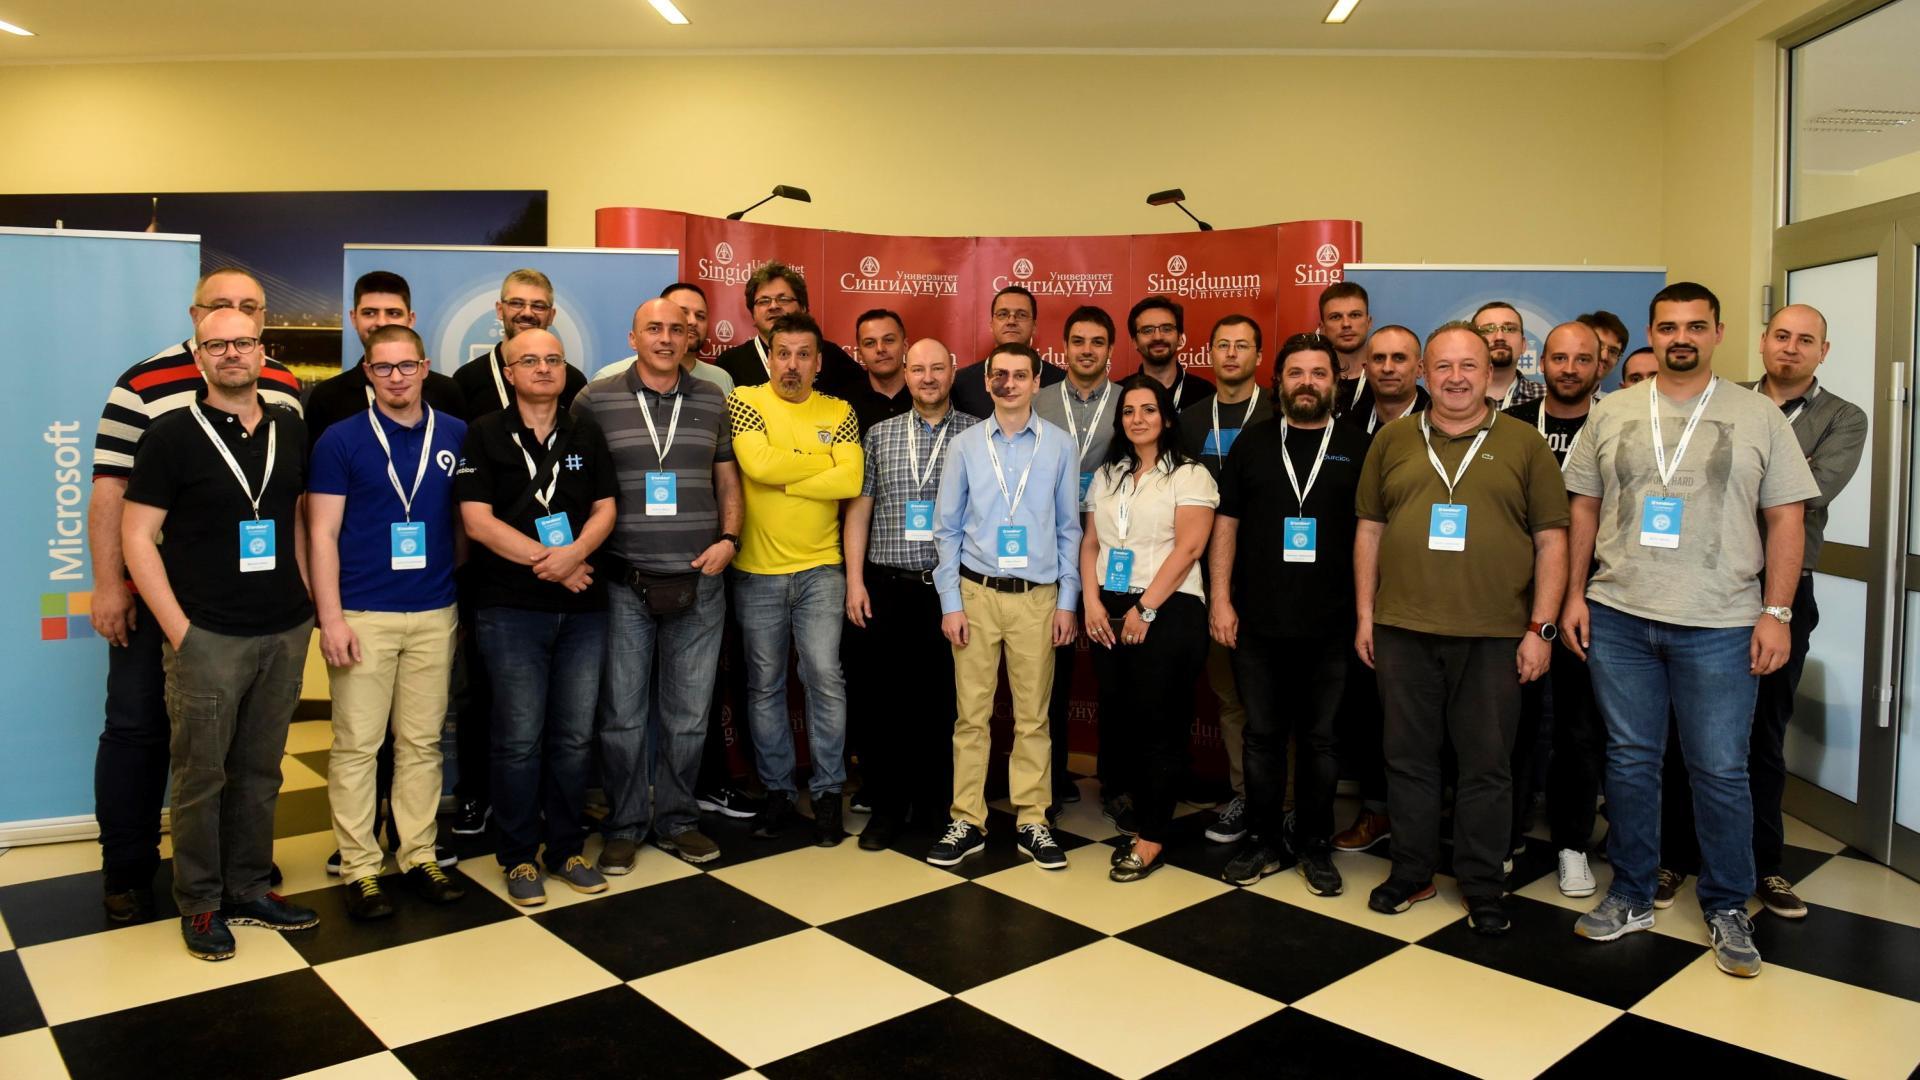 Fotografija-2-Tarabica-konferencija